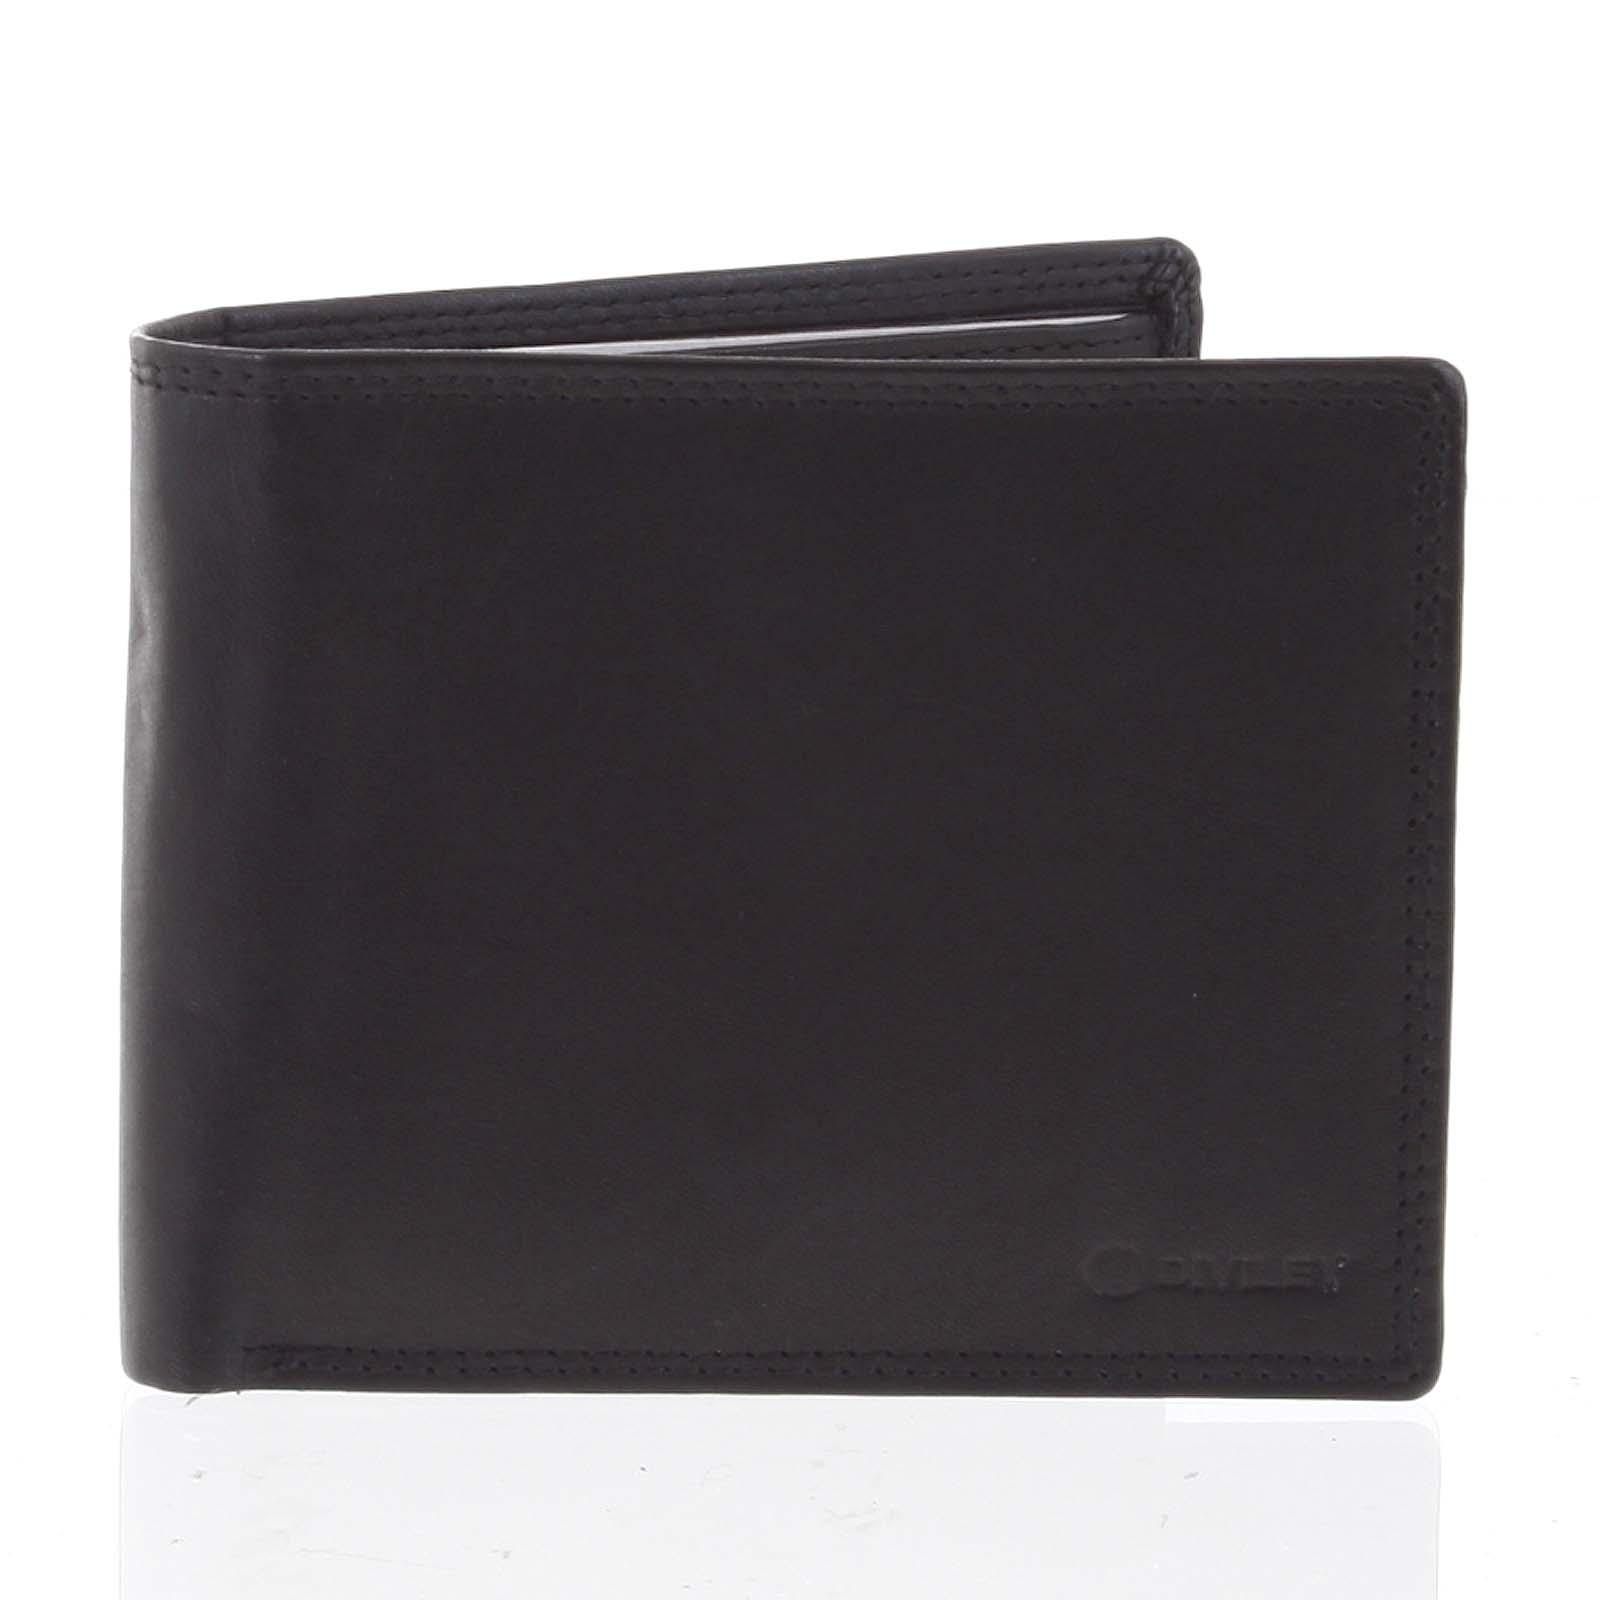 Praktická pánska voľná čierna peňaženka - Diviley Unibertsoa